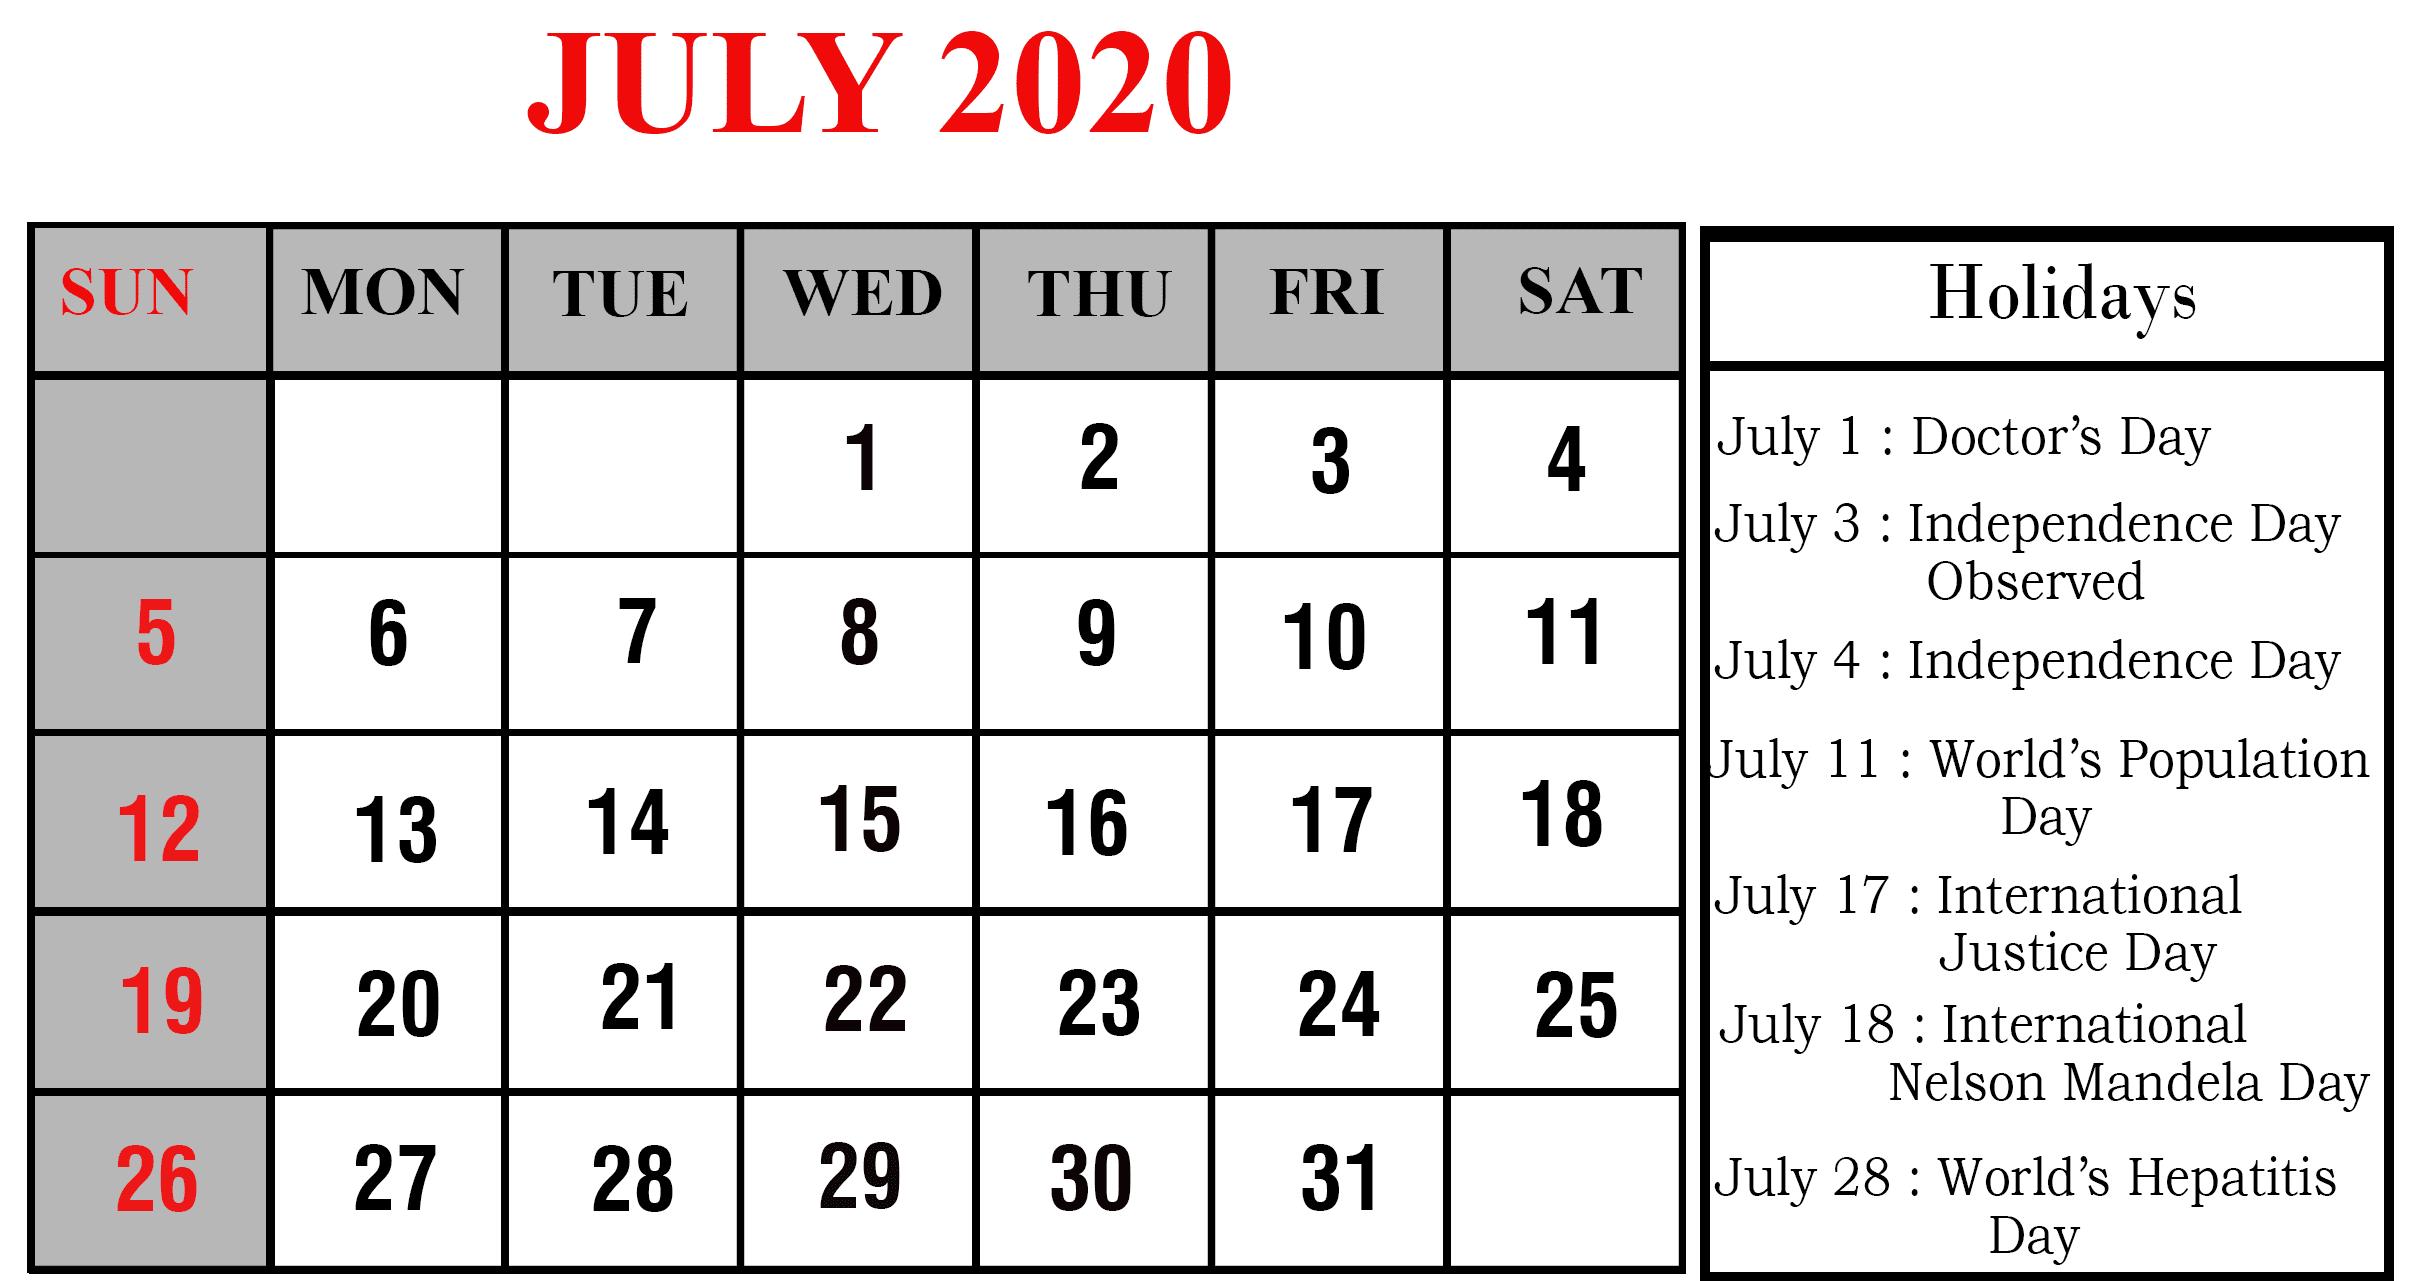 July 2020 Calendar USA Holidays